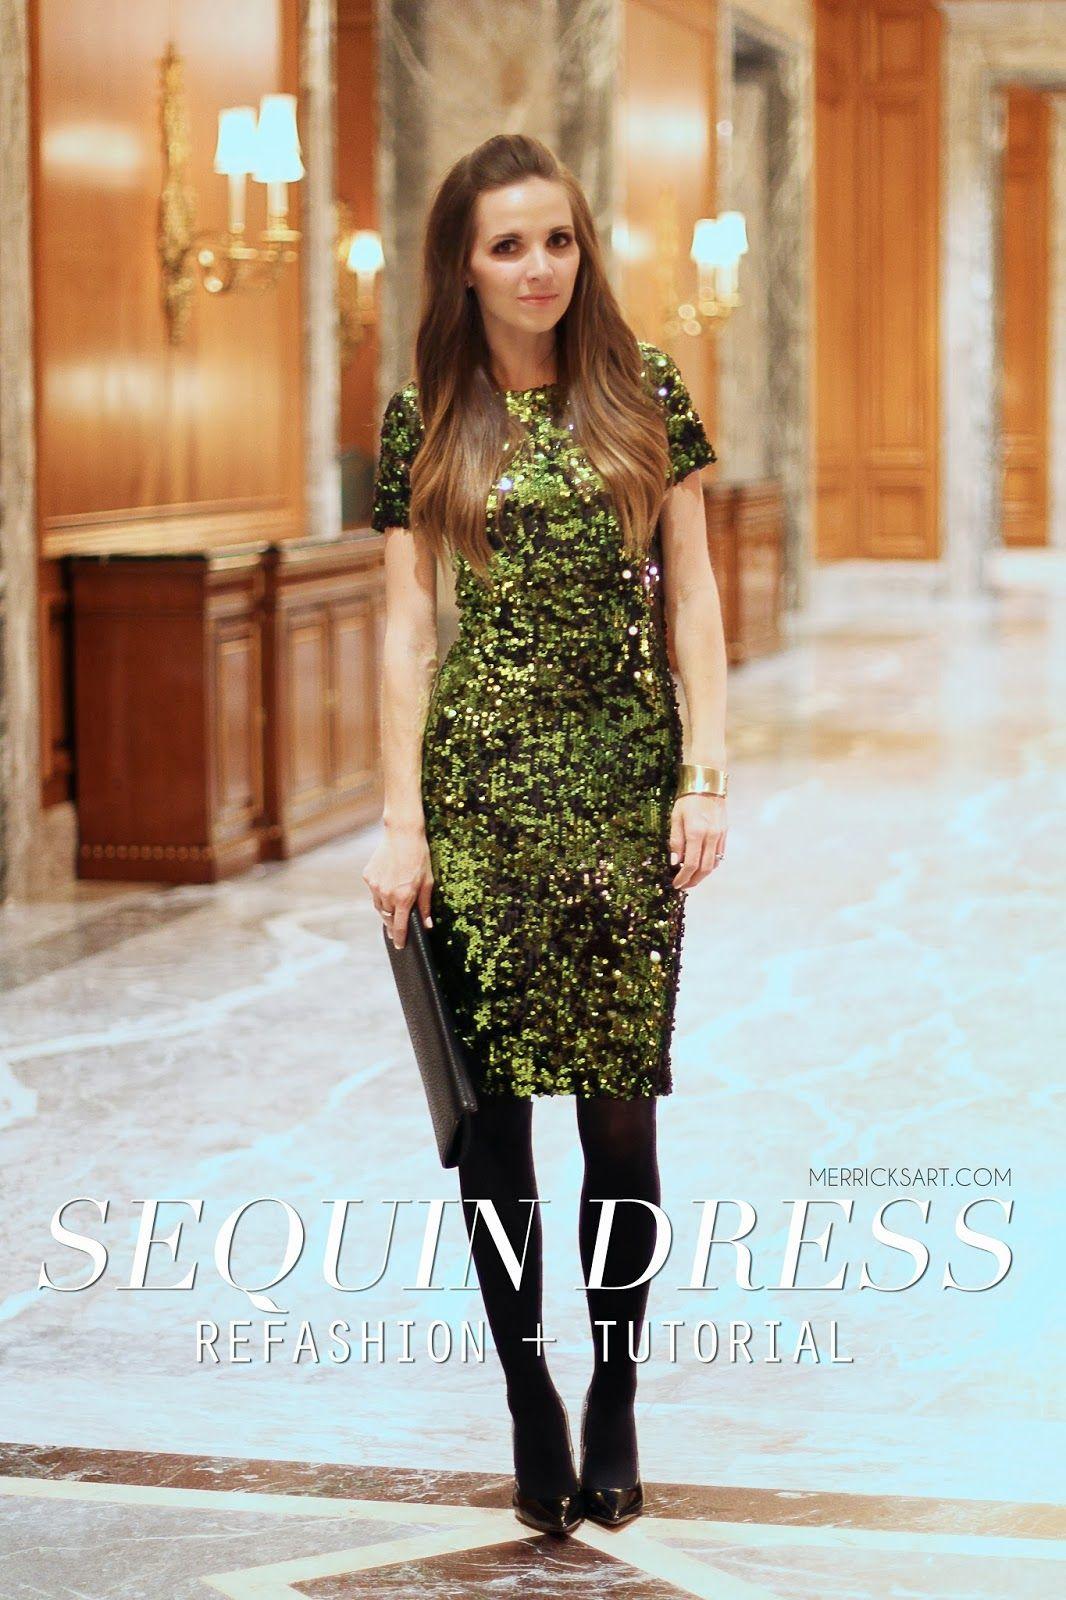 Merricks Art: SEQUIN DRESS REFASHION + TUTORIAL